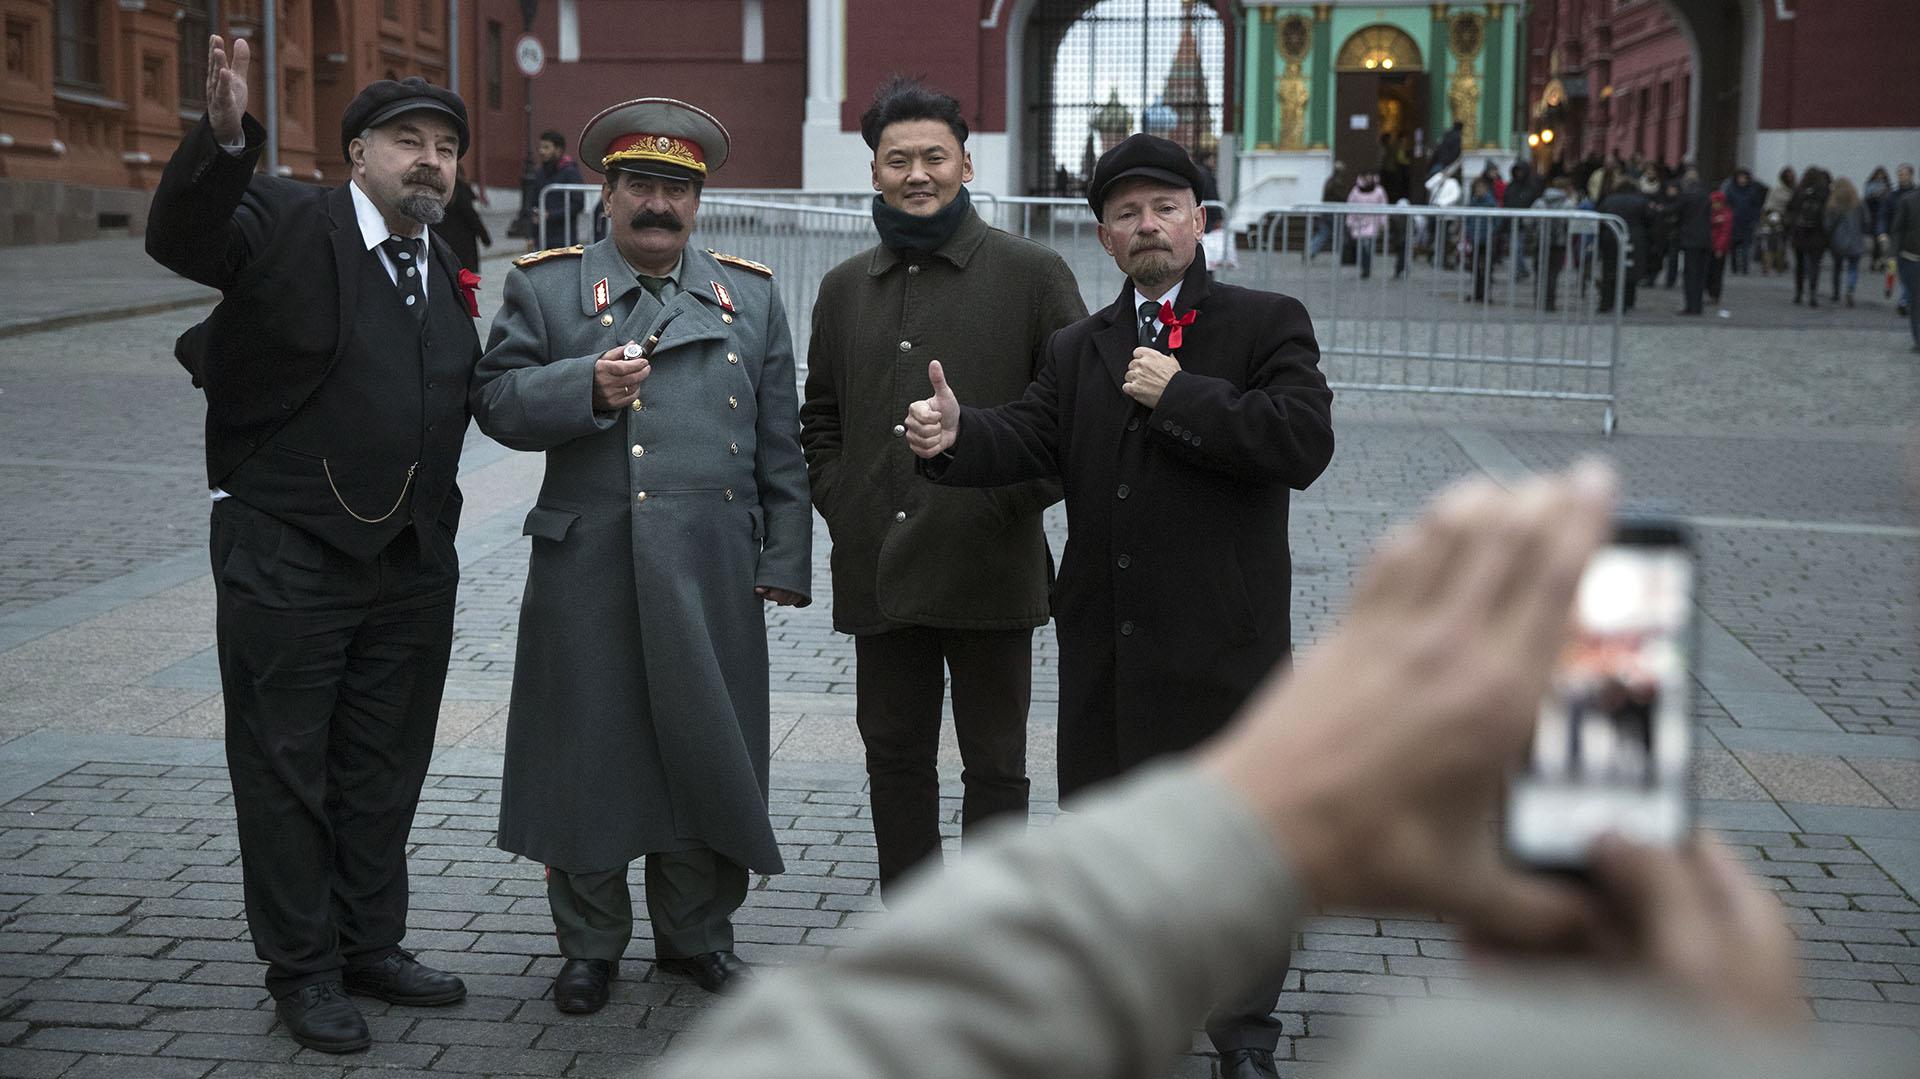 Sergei Soloviev y otros imitadores se fotografían junto a un turista en la plaza roja (AP Photo/Pavel Golovkin)